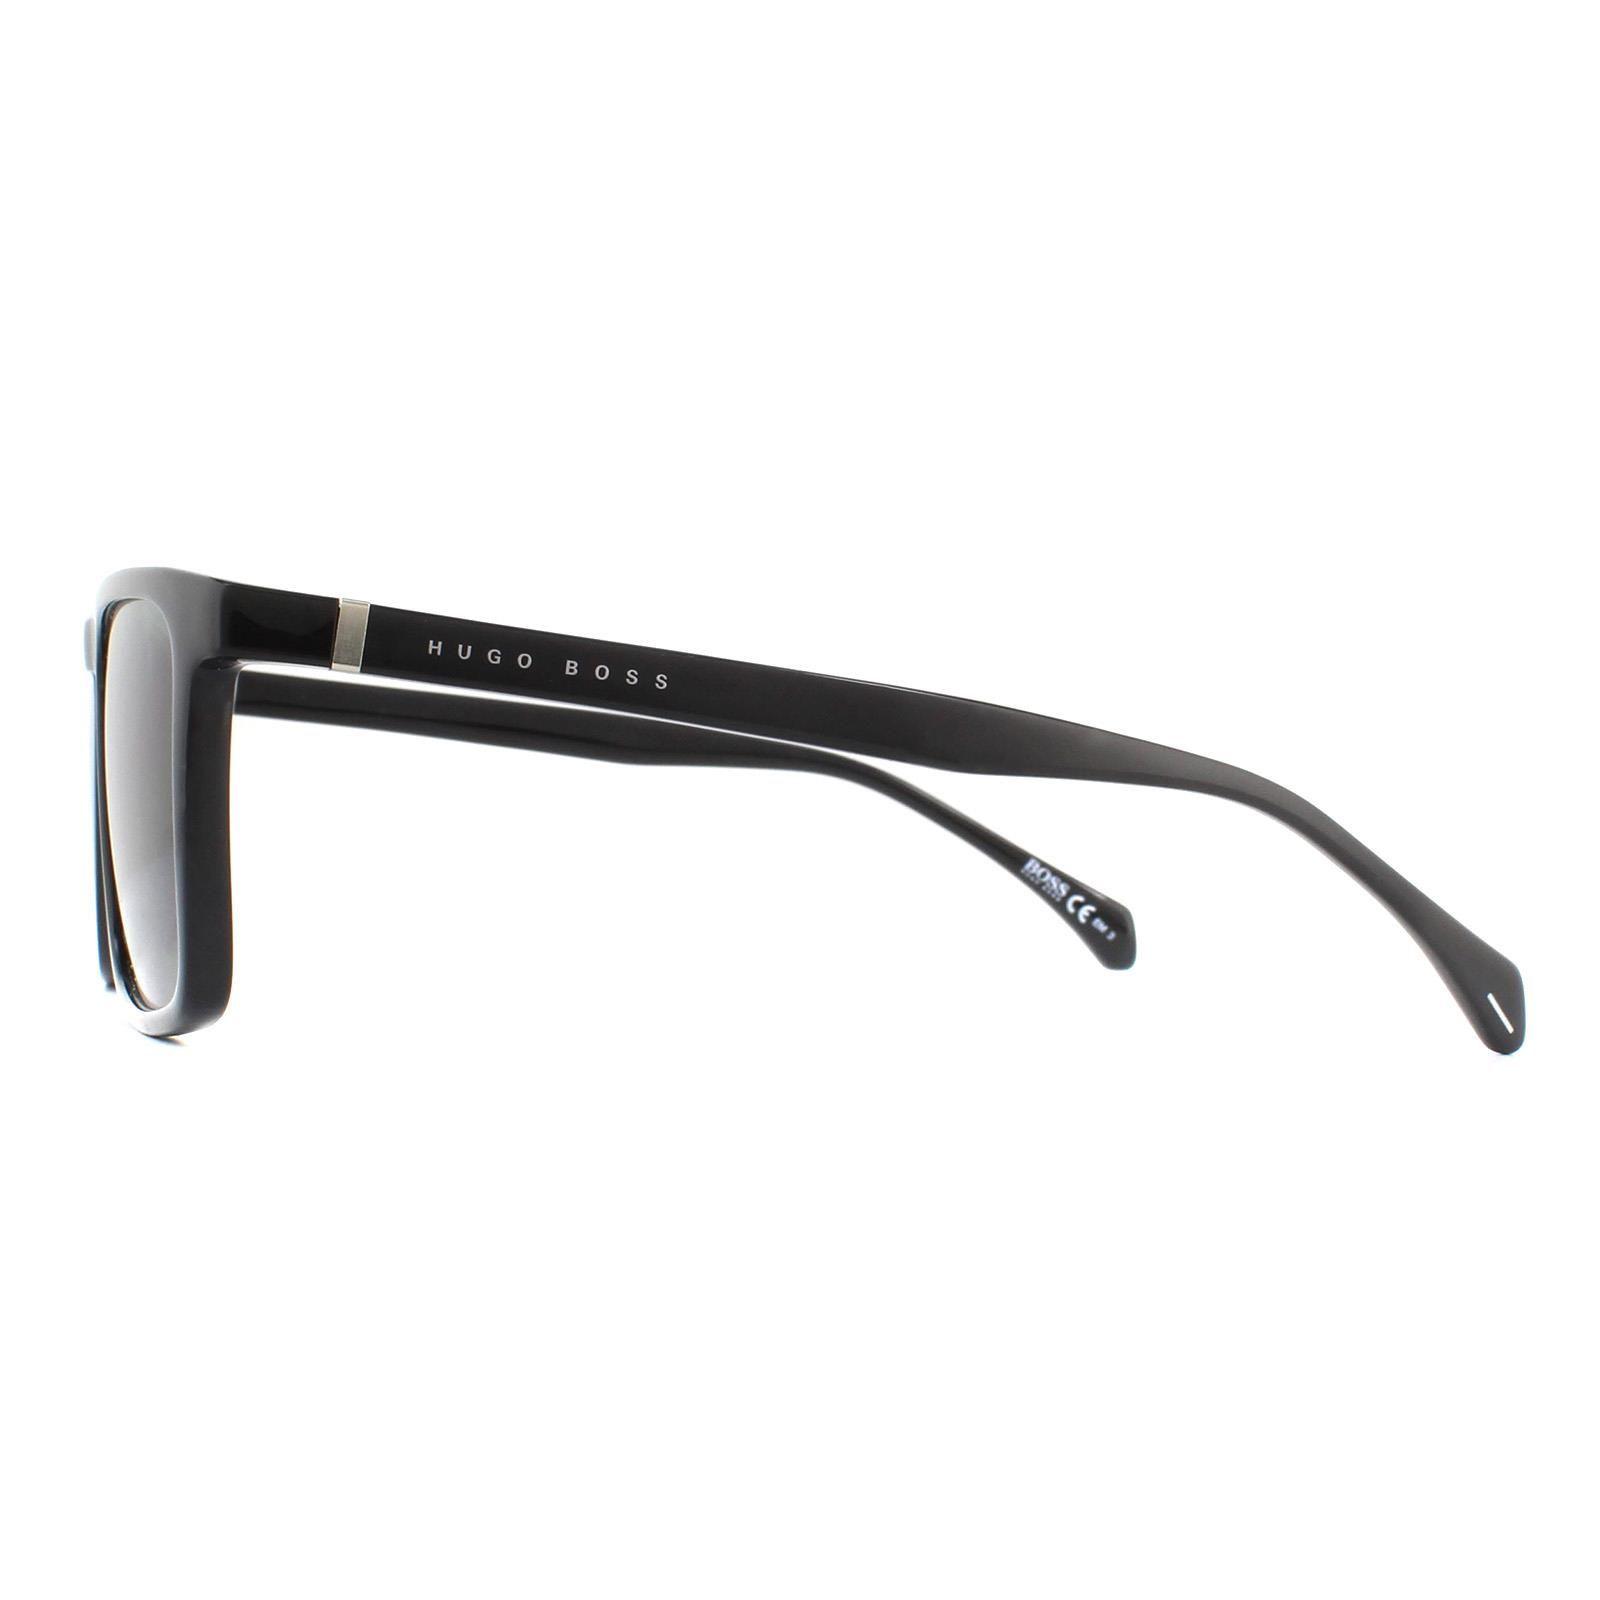 Hugo Boss Sunglasses 1082/S 807 QT Shiny Black Grey Green